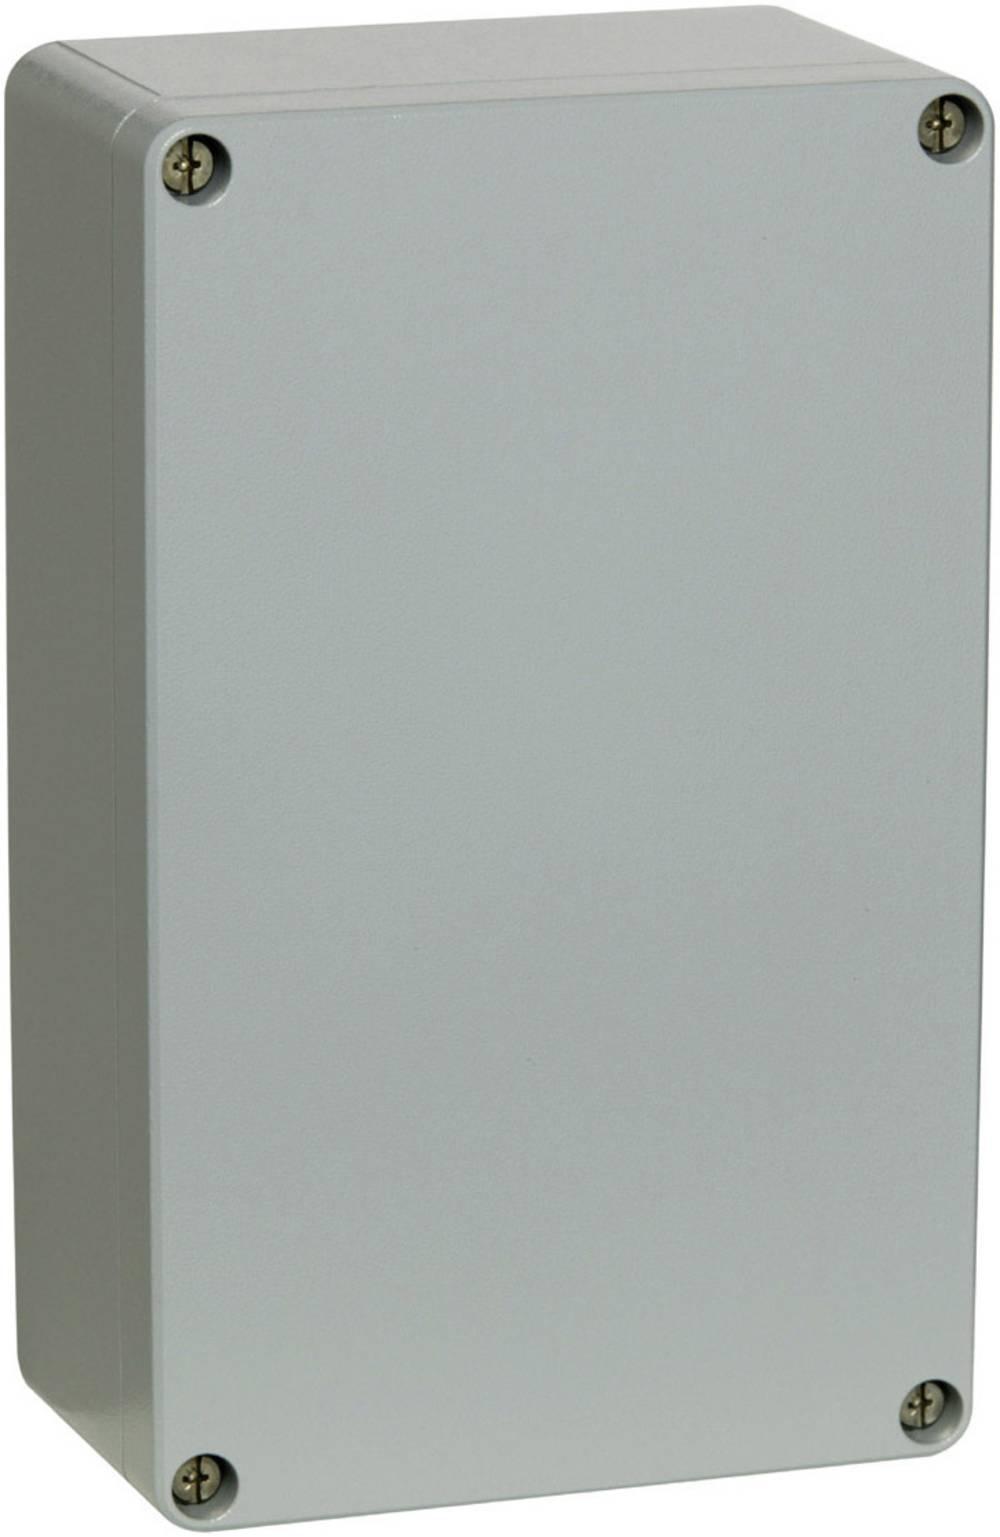 Fibox AL 082506-Univerzalno kućište, aluminij, srebrno sivo (RAL 7001), 252x81x56.5mm 7811190